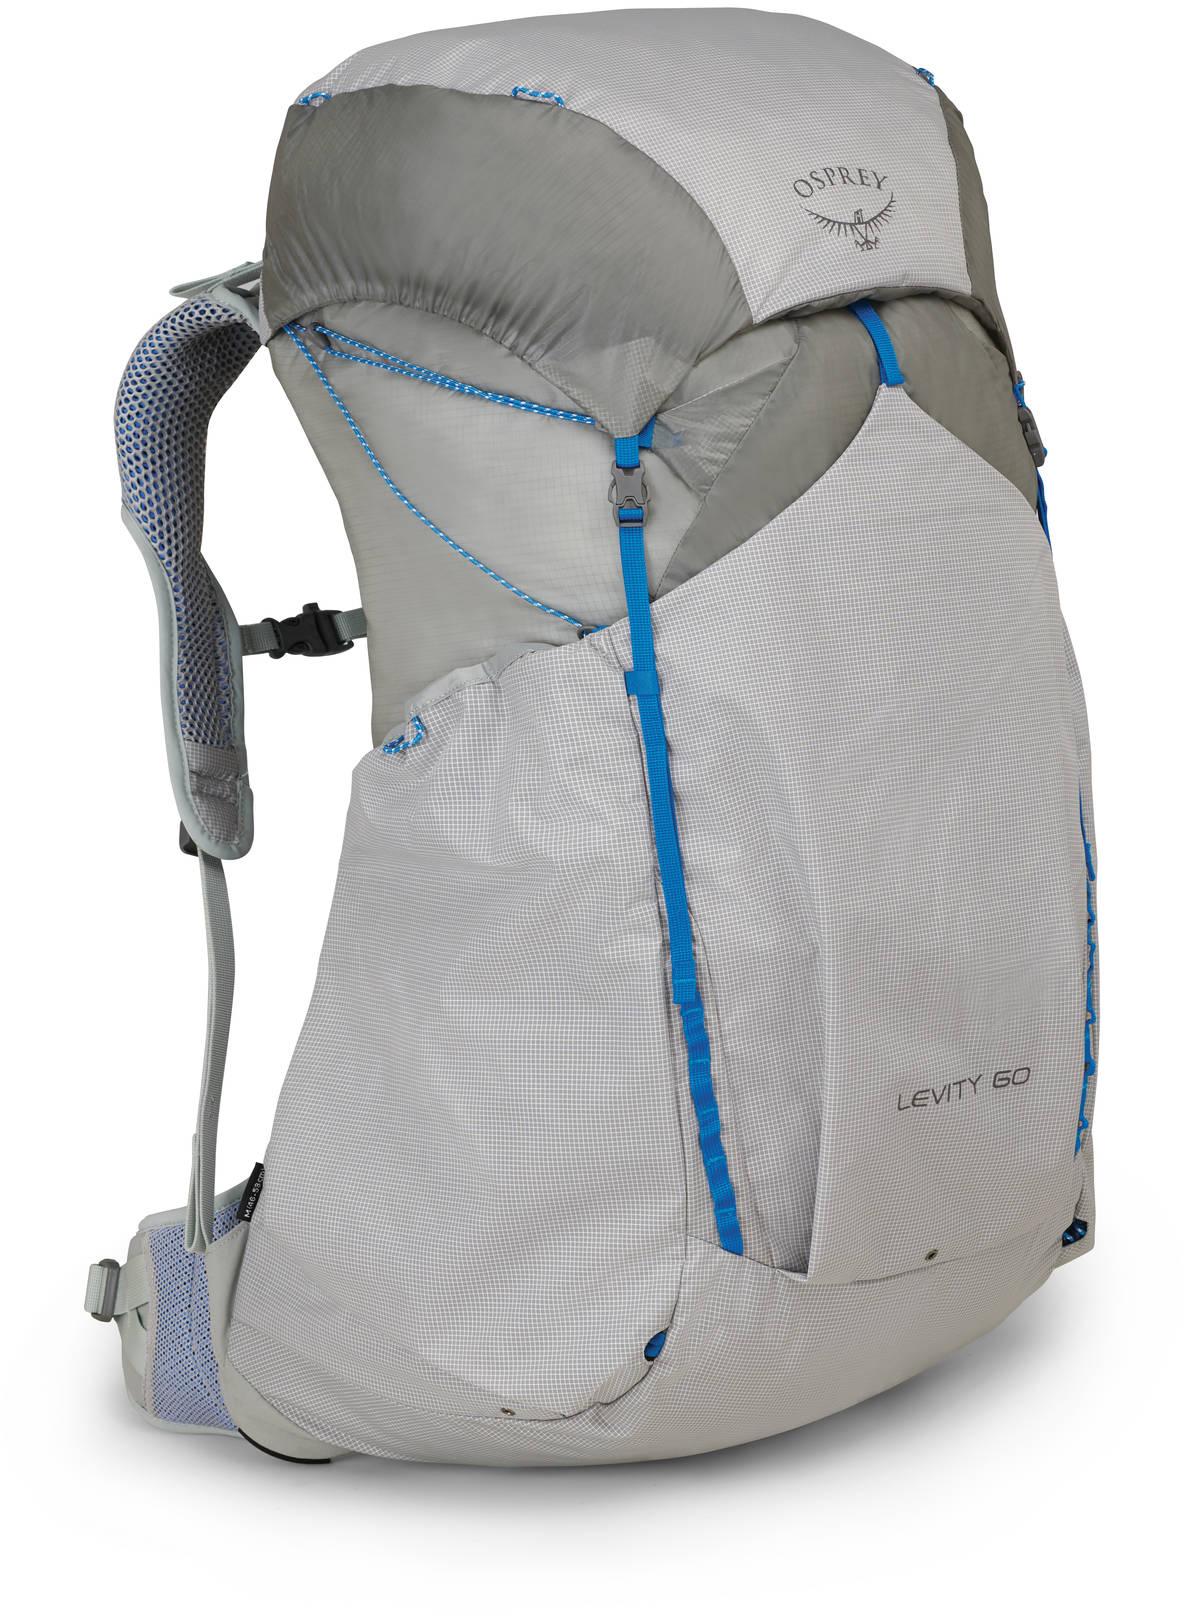 Туристические рюкзаки Рюкзак туристический Osprey Levity 60 Parallax Silver (2019) Levity60_S18_Side_ParallaxSilver_web.jpg